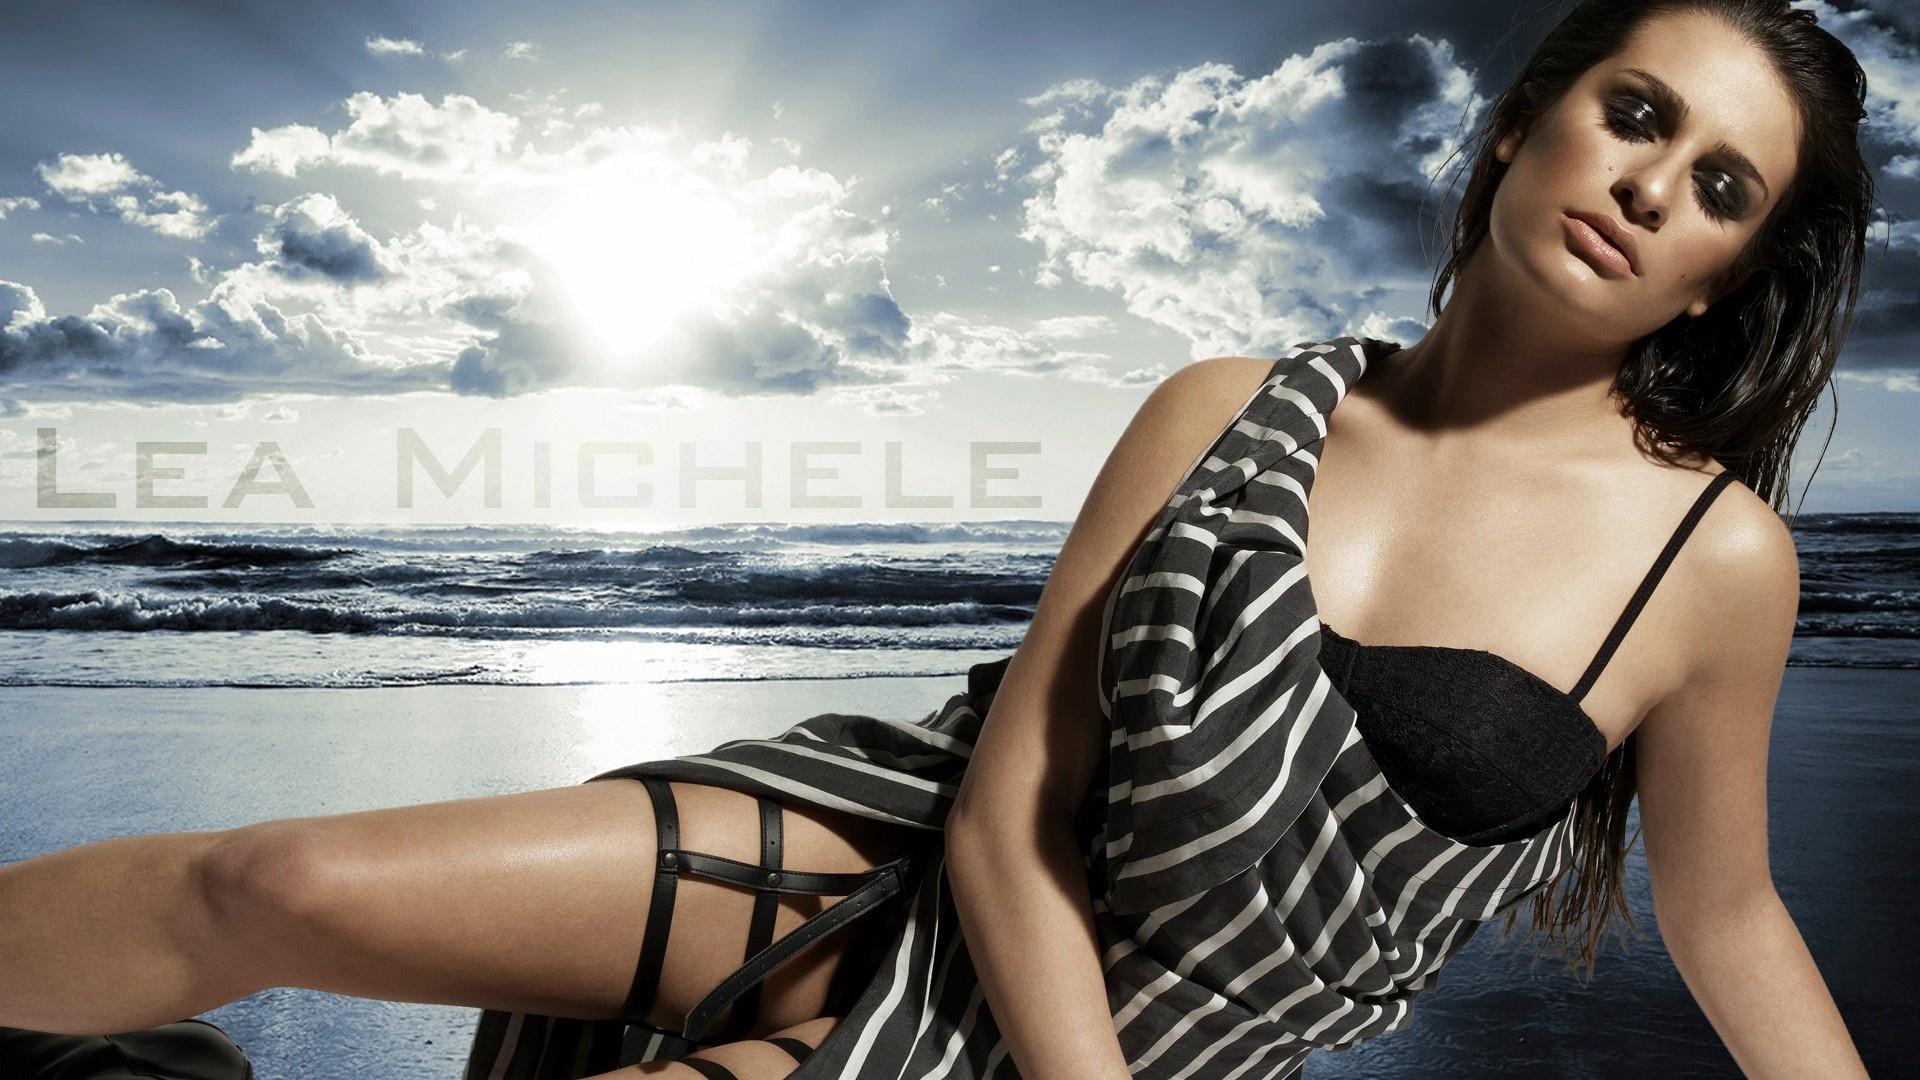 Lea Michele Desktop